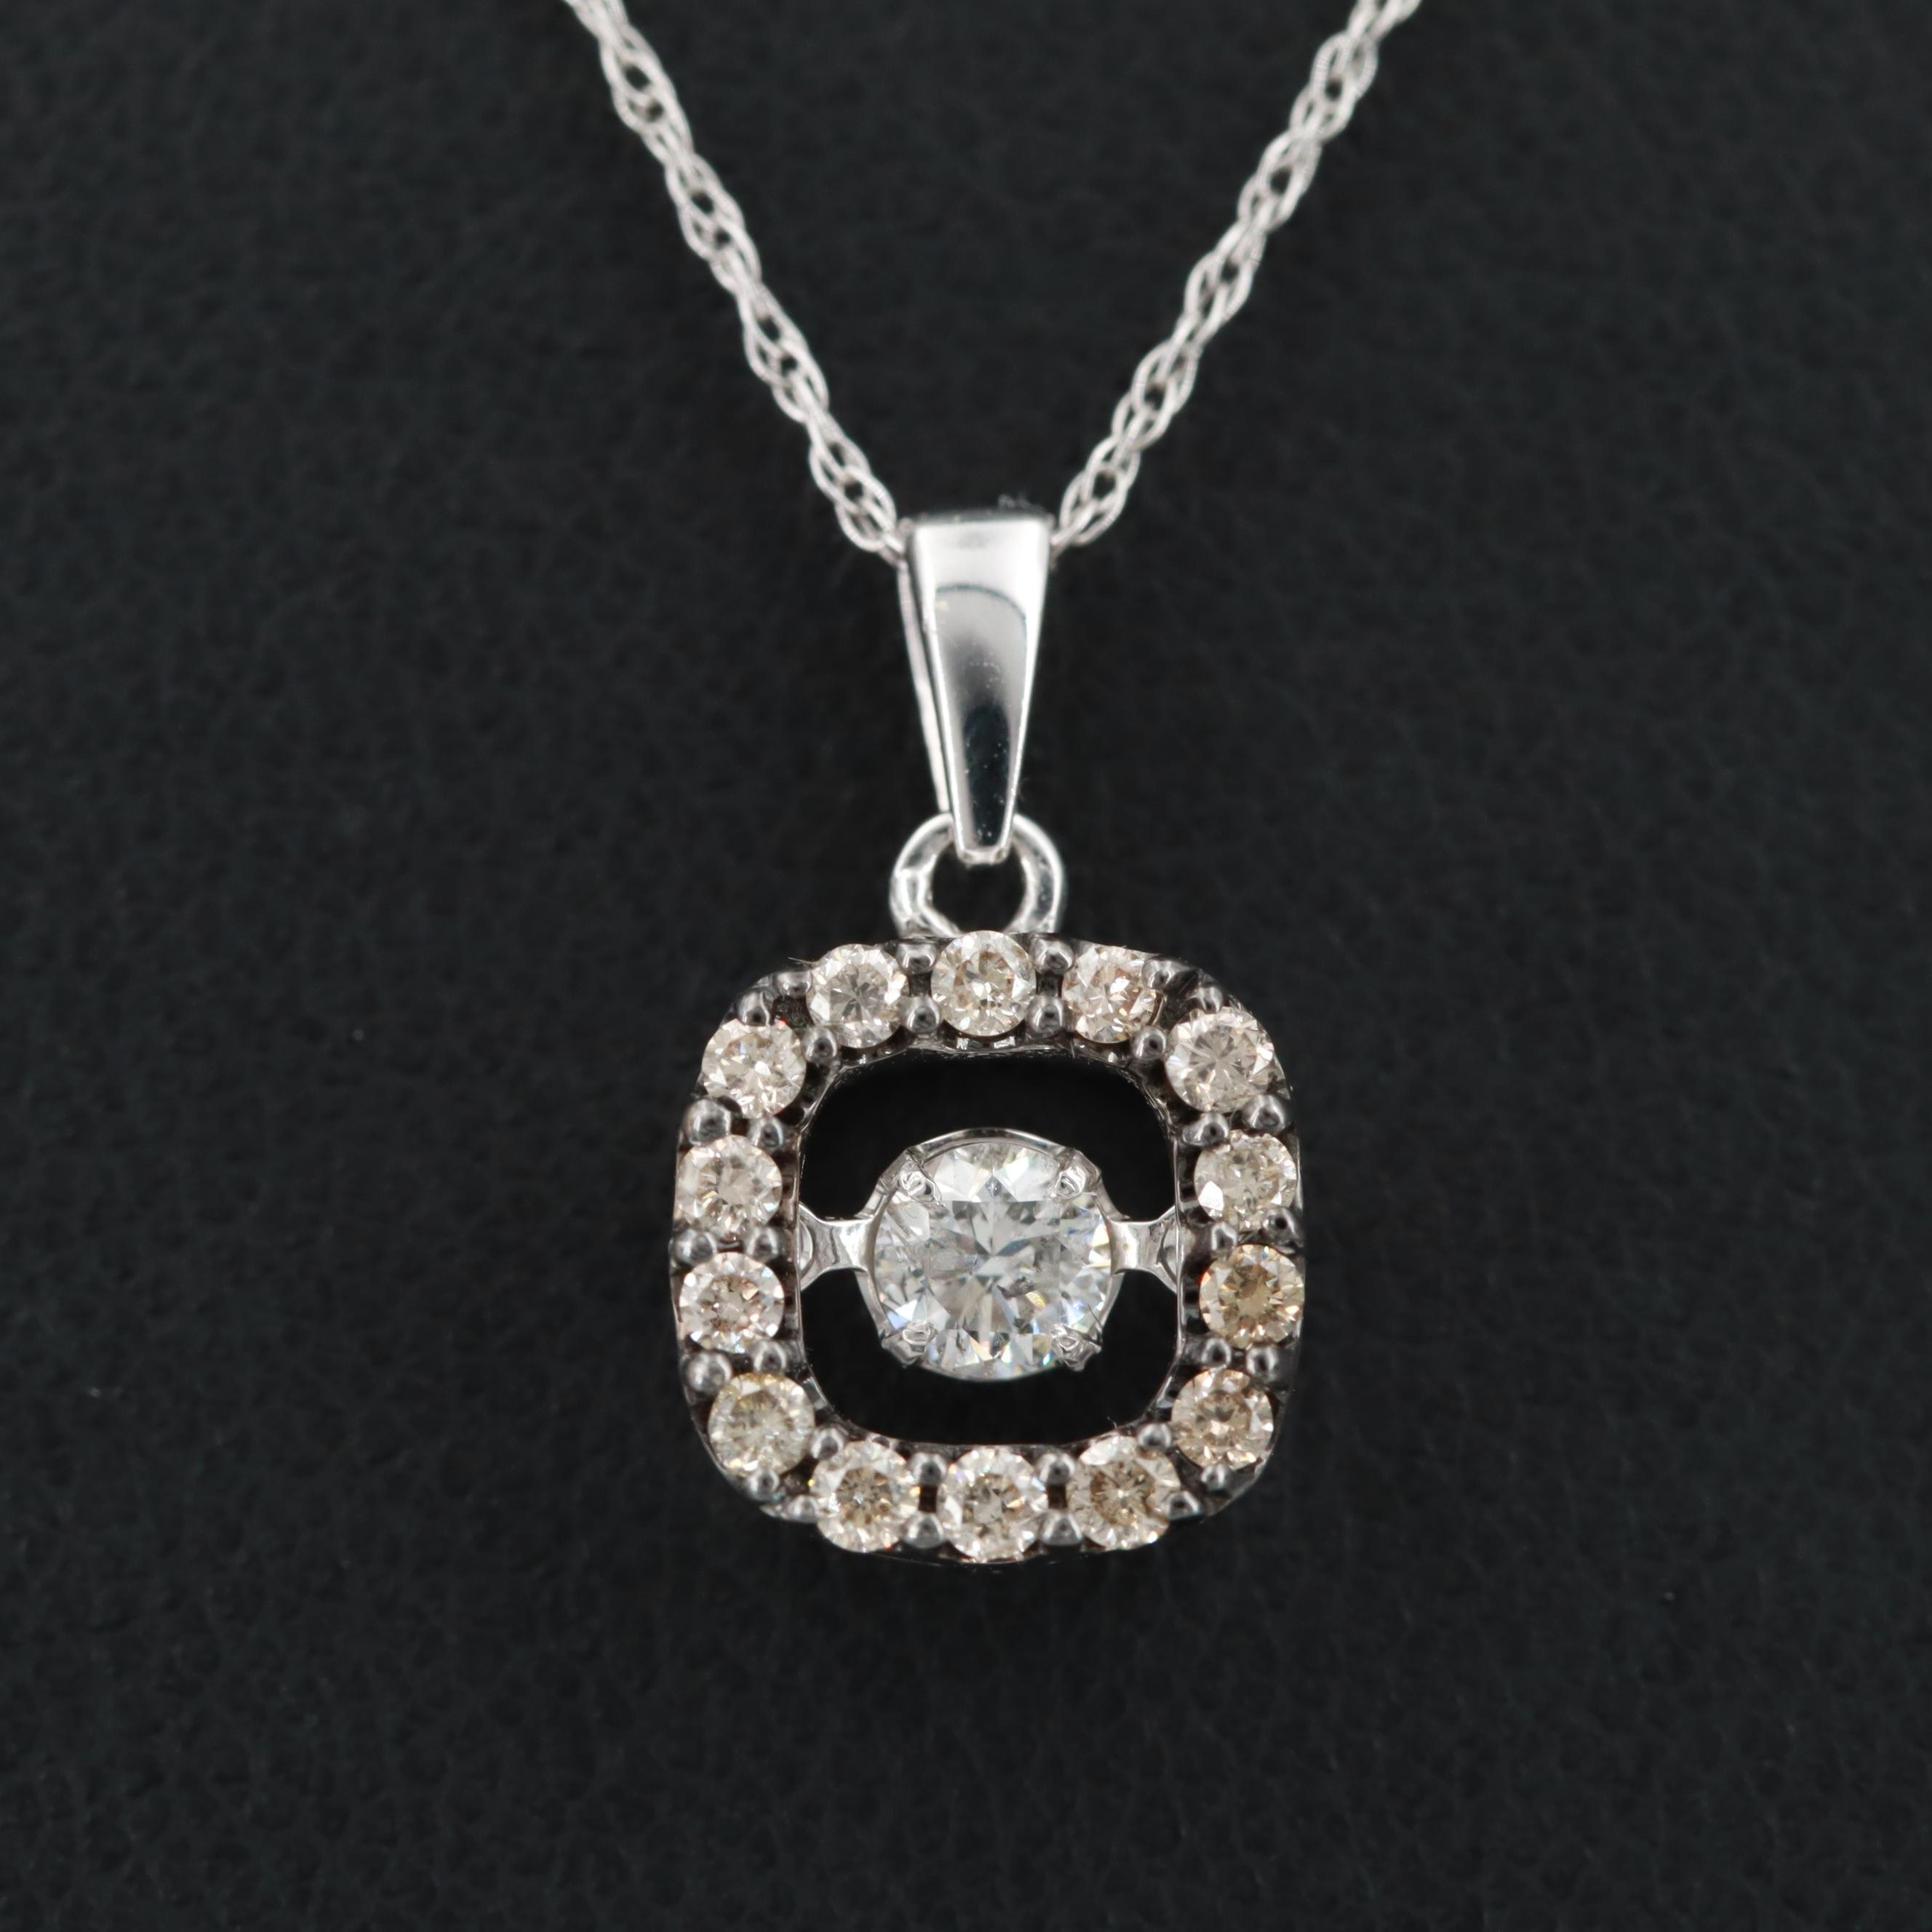 10K White Gold Diamond Trembler Pendant Necklace